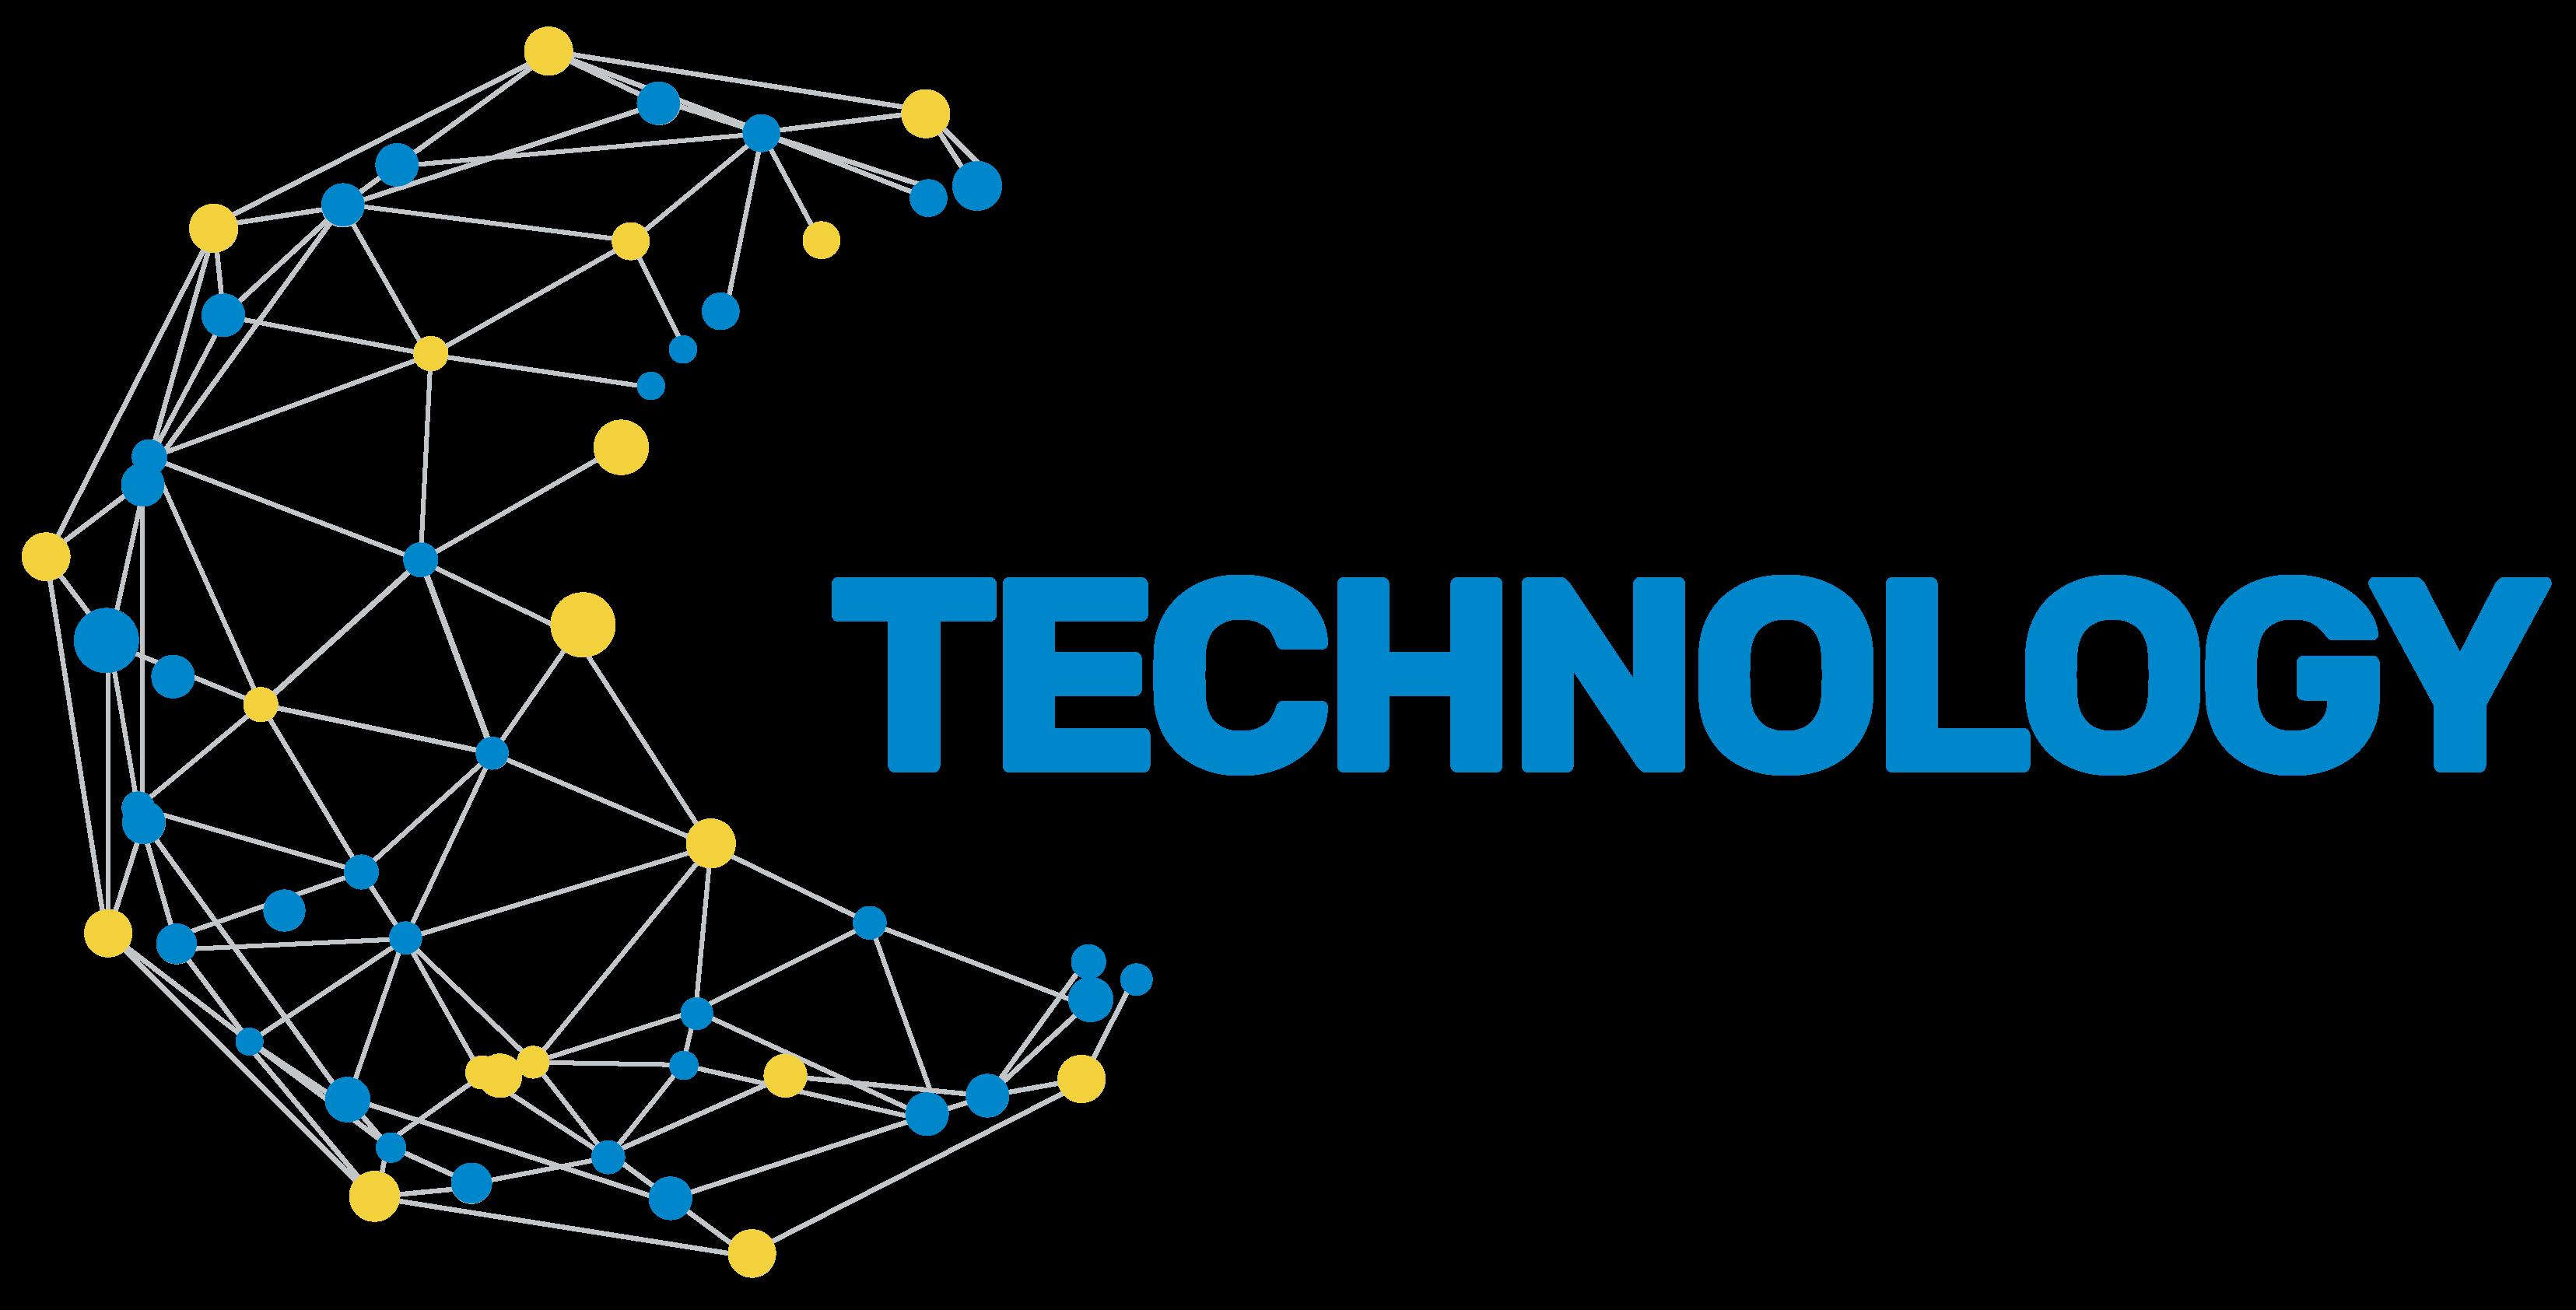 poletechnology